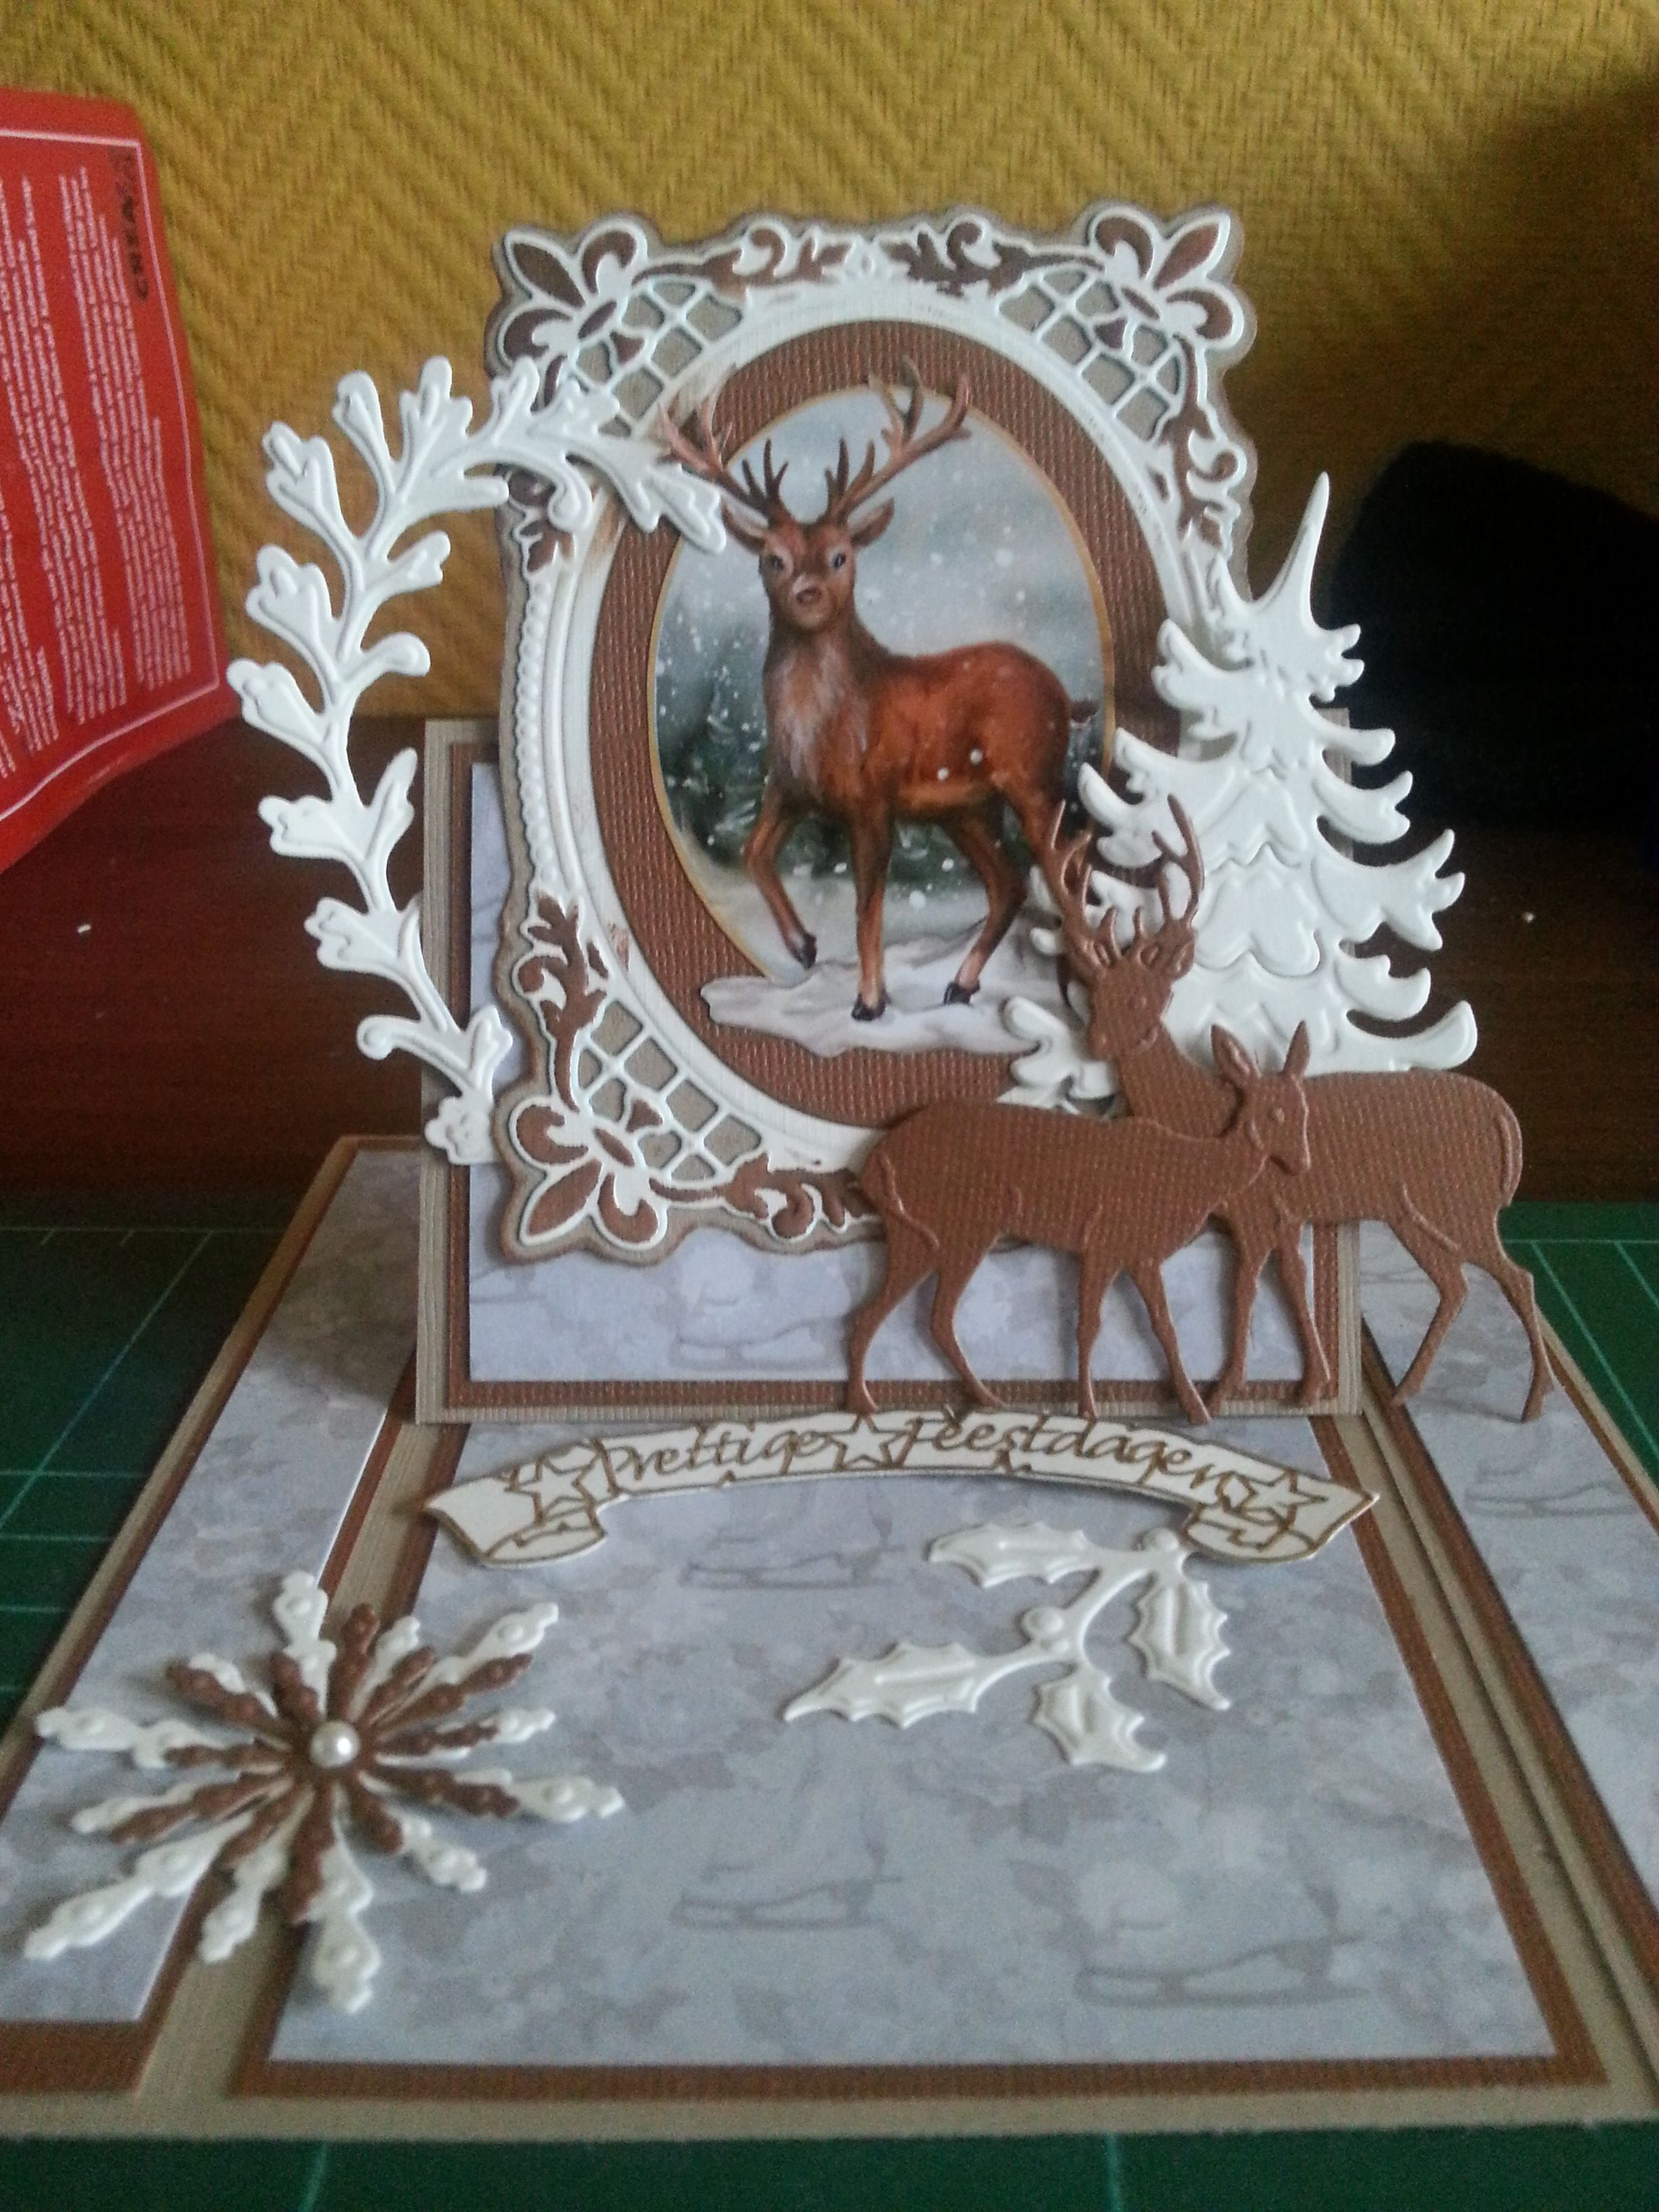 wedstrijdkaart nr 1 kerstkaarten. Black Bedroom Furniture Sets. Home Design Ideas